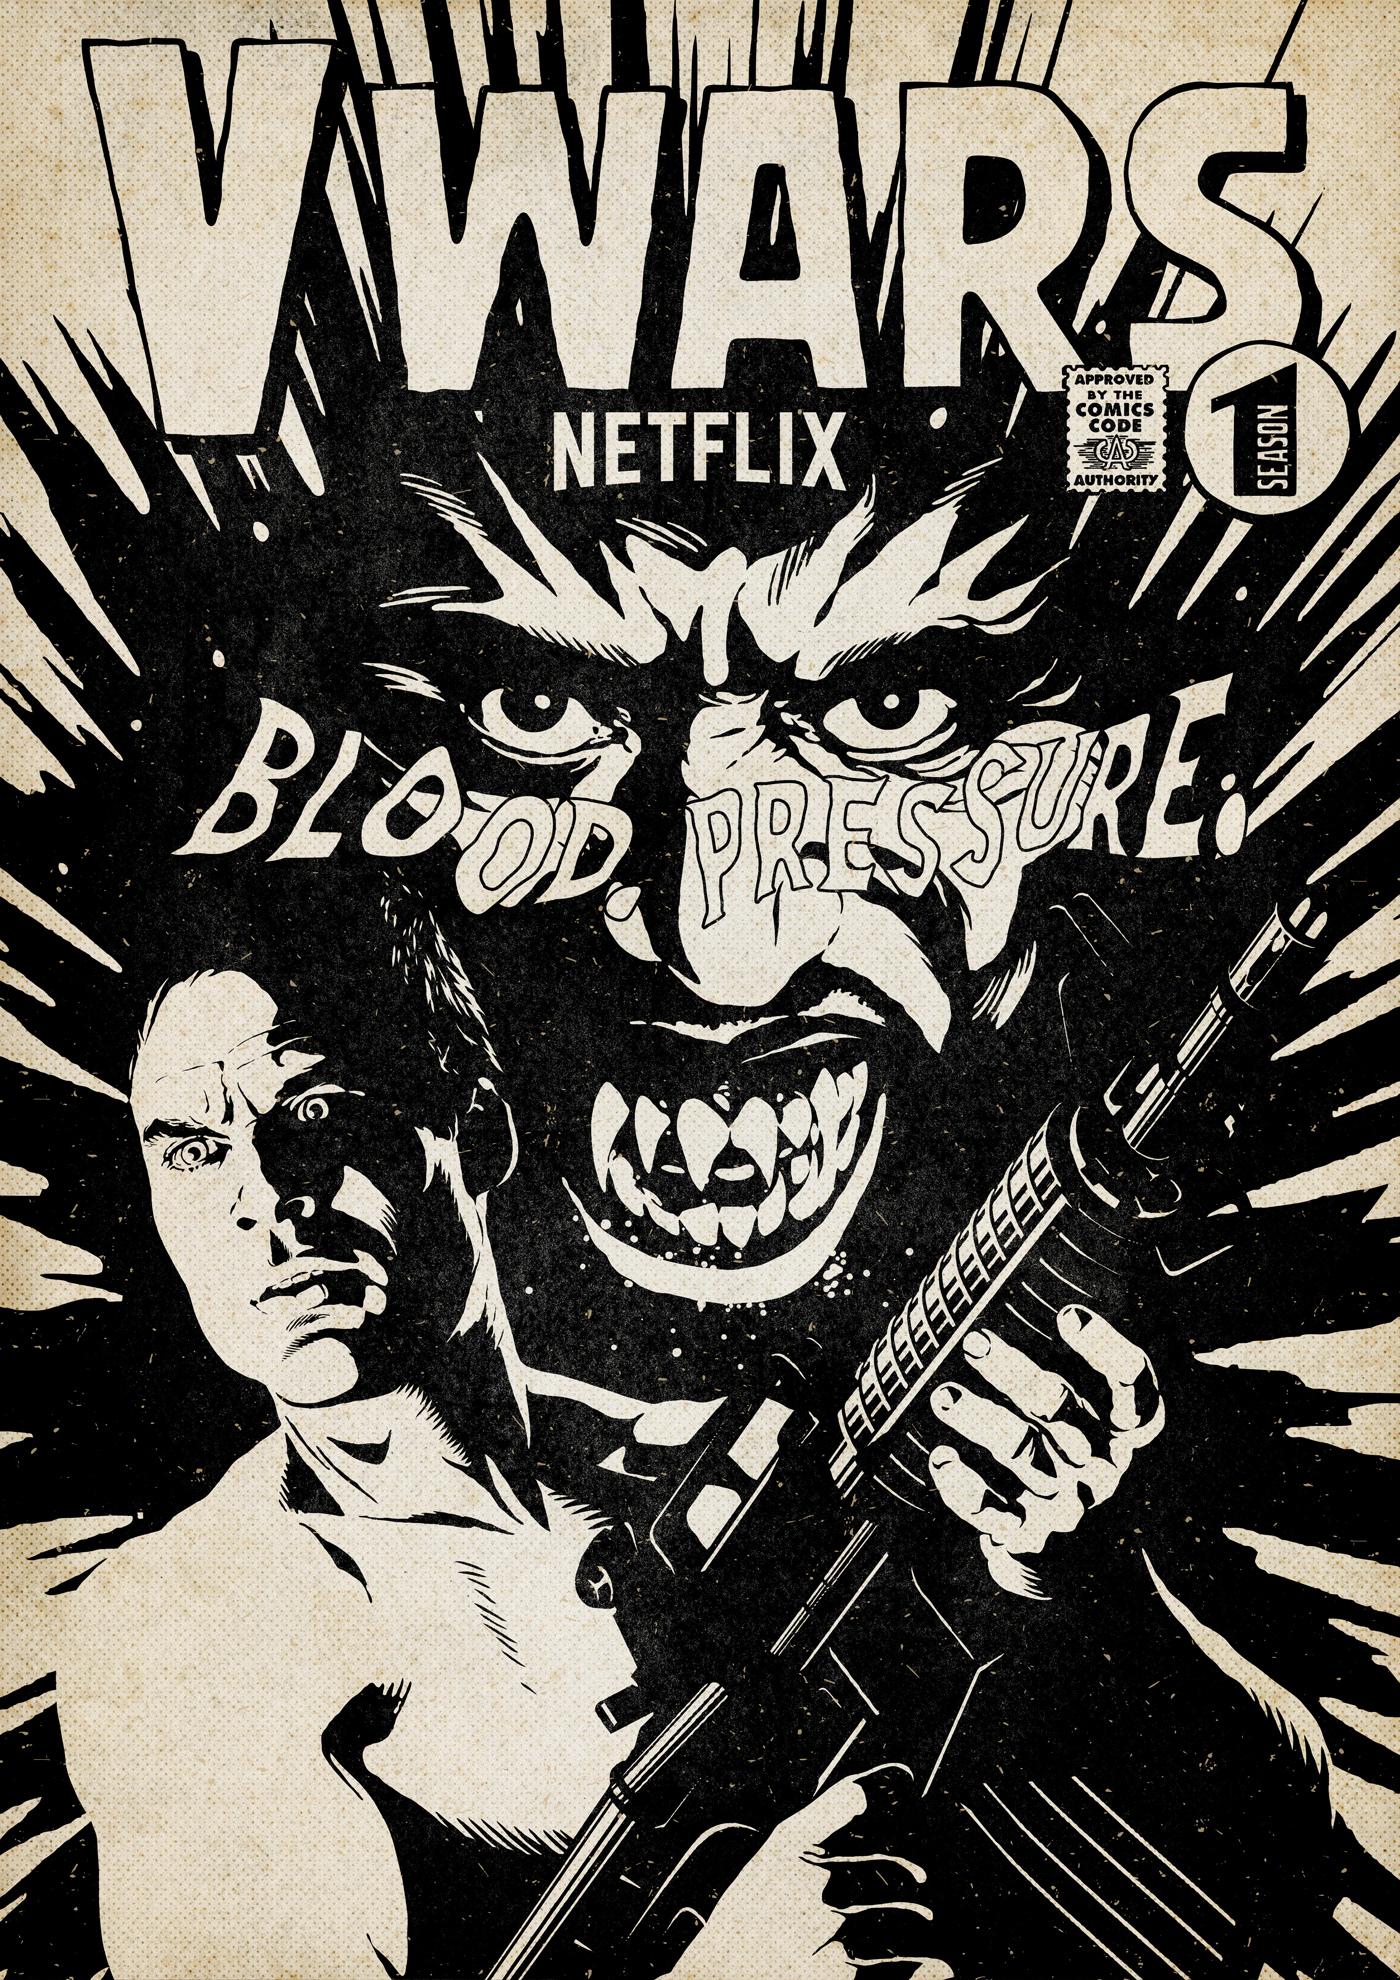 Netflix v wars vampire vintage comics